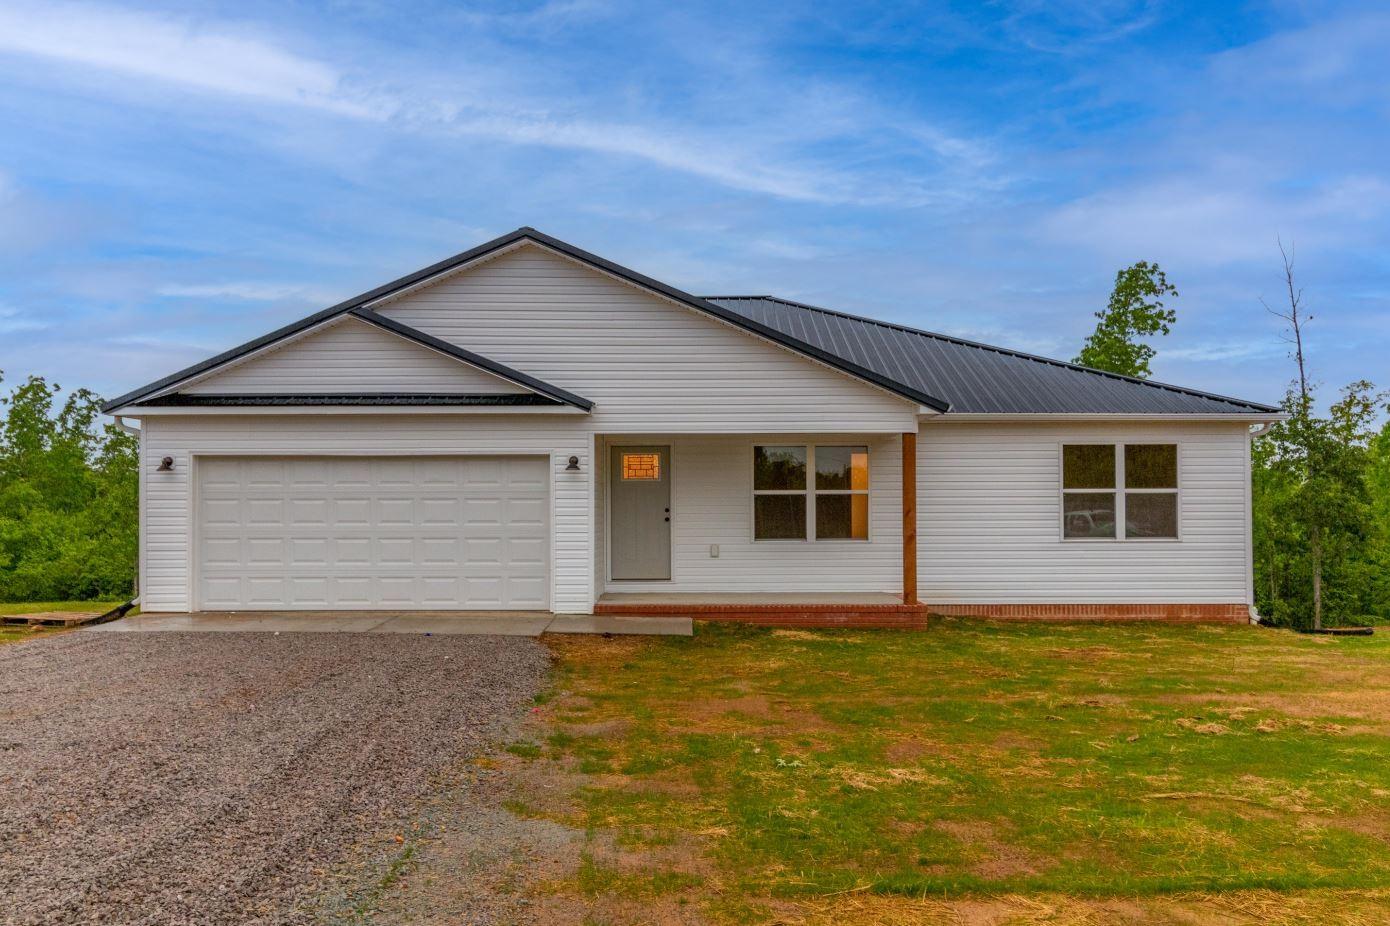 134 Gracey Ln Property Photo - Hohenwald, TN real estate listing